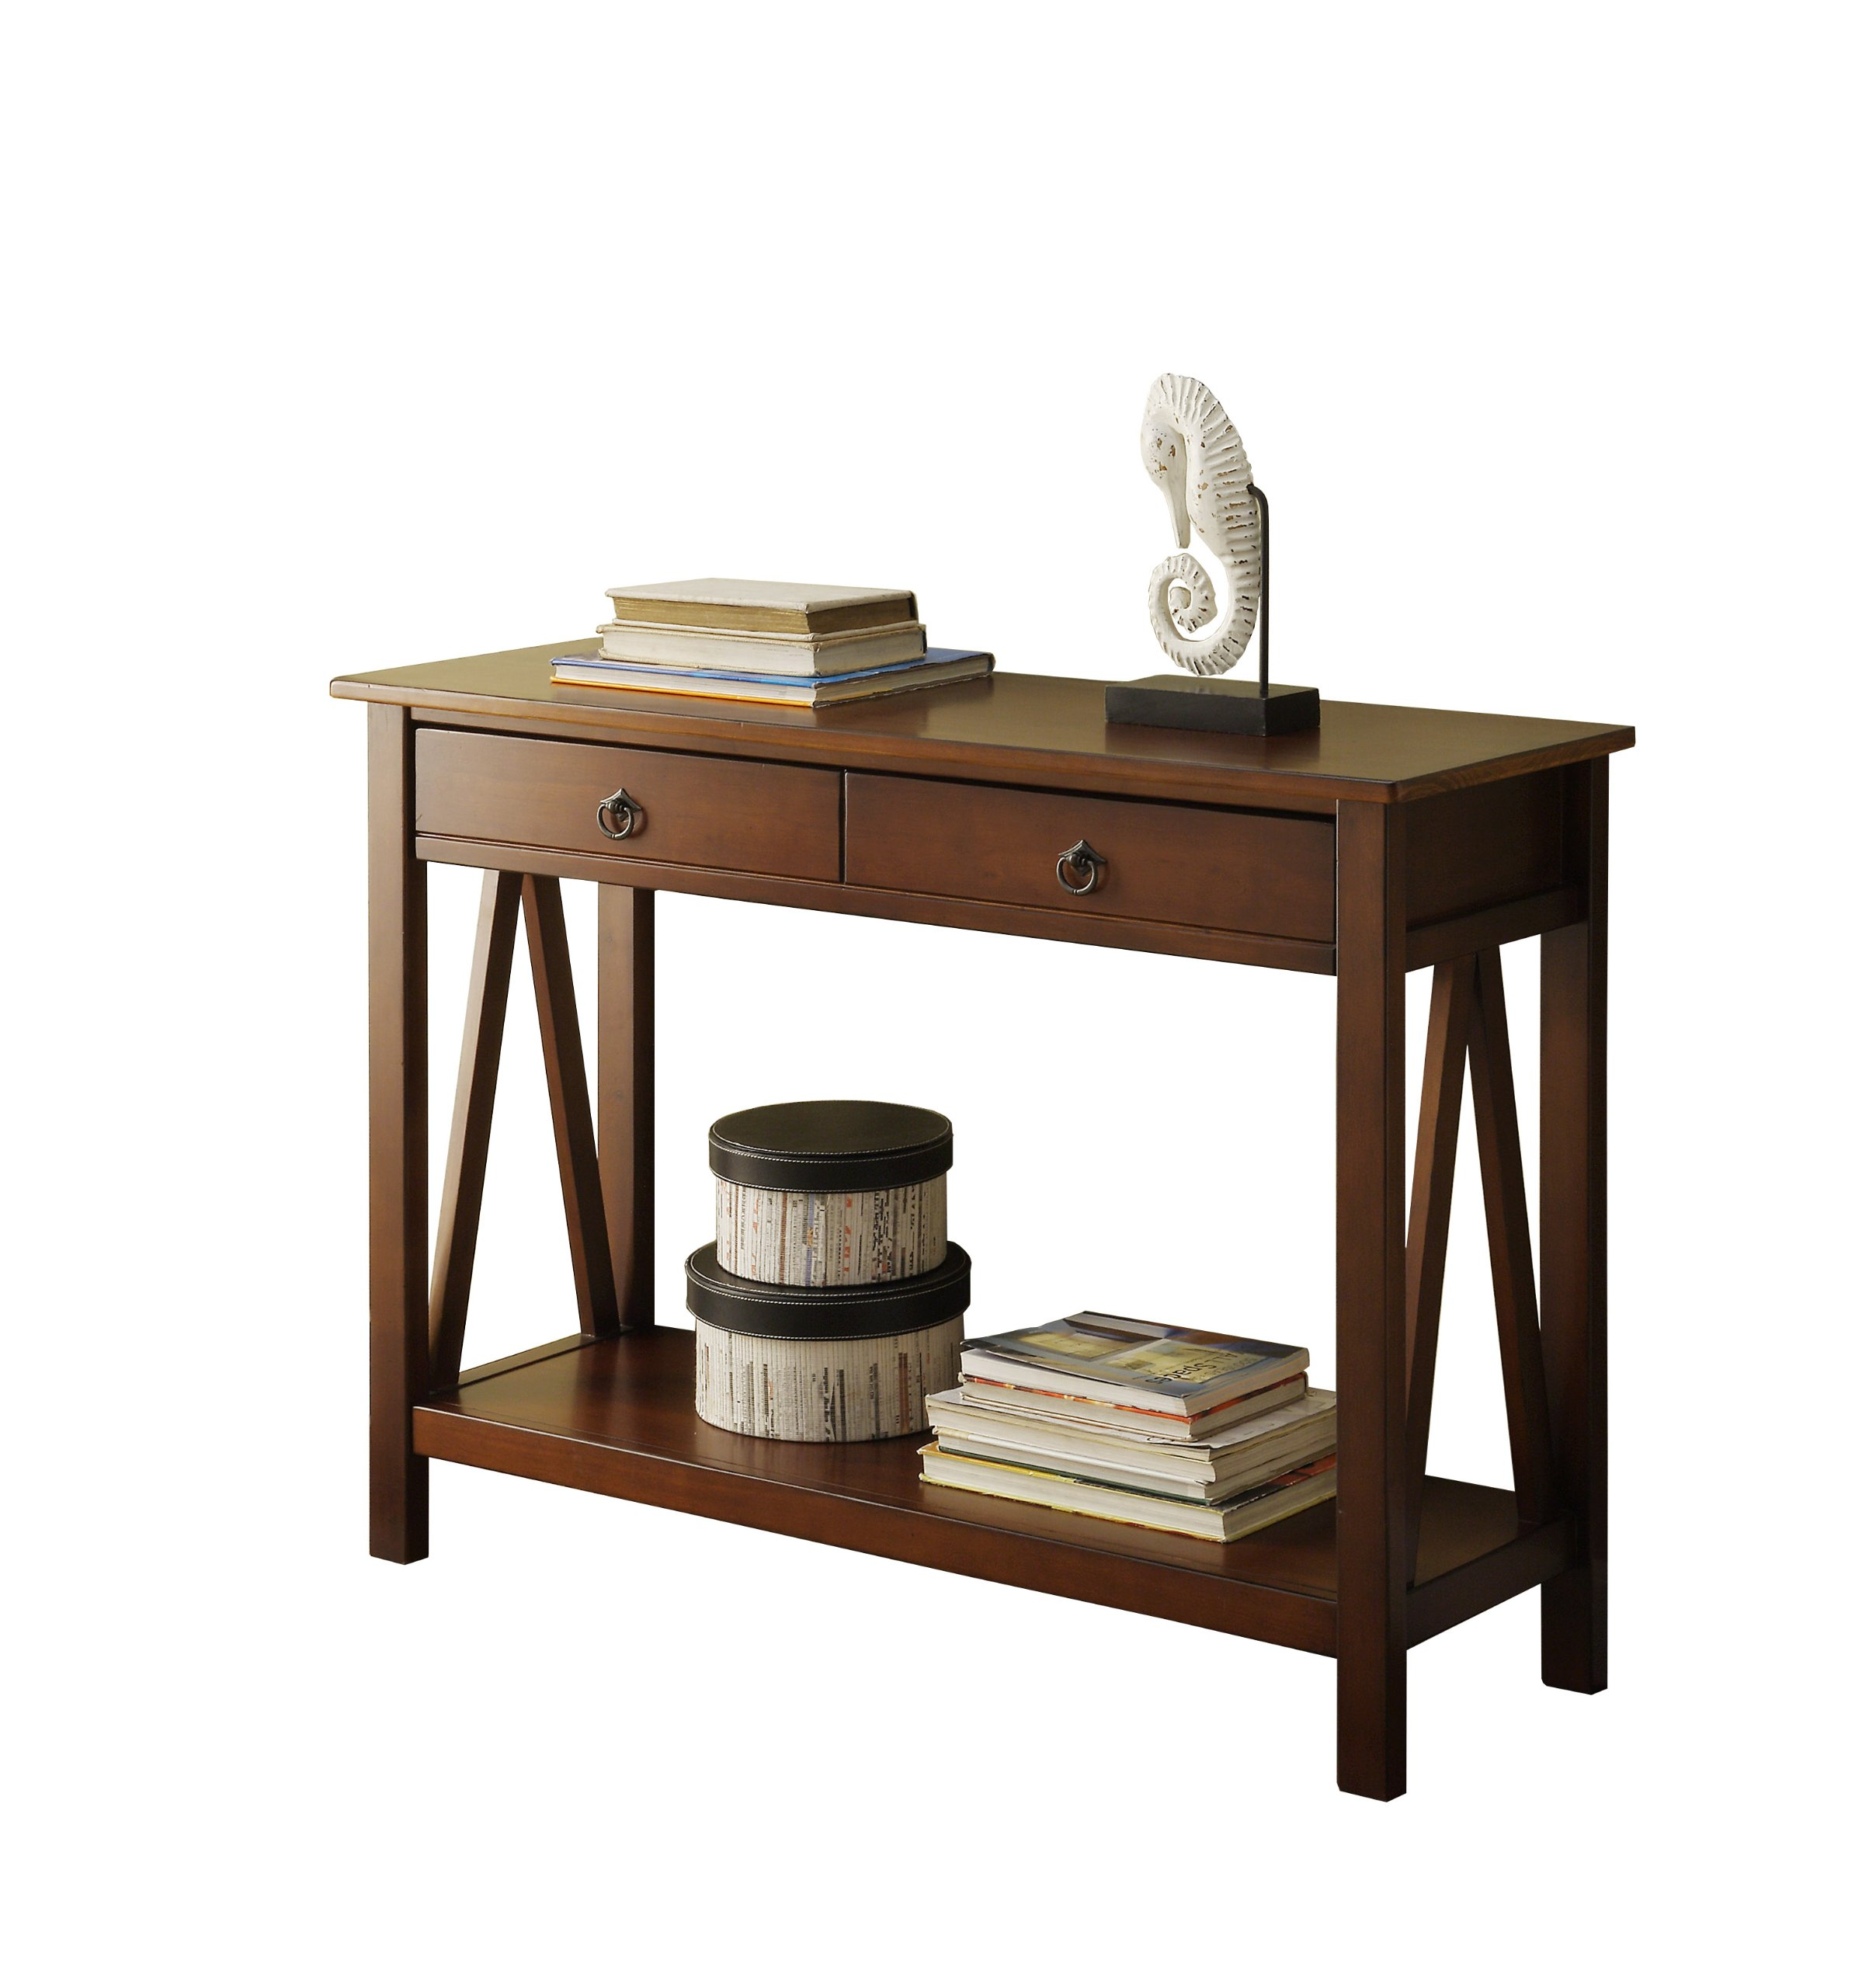 Art Van Coffee Table Sets: Linon Home Decor Titian Antique Console Table